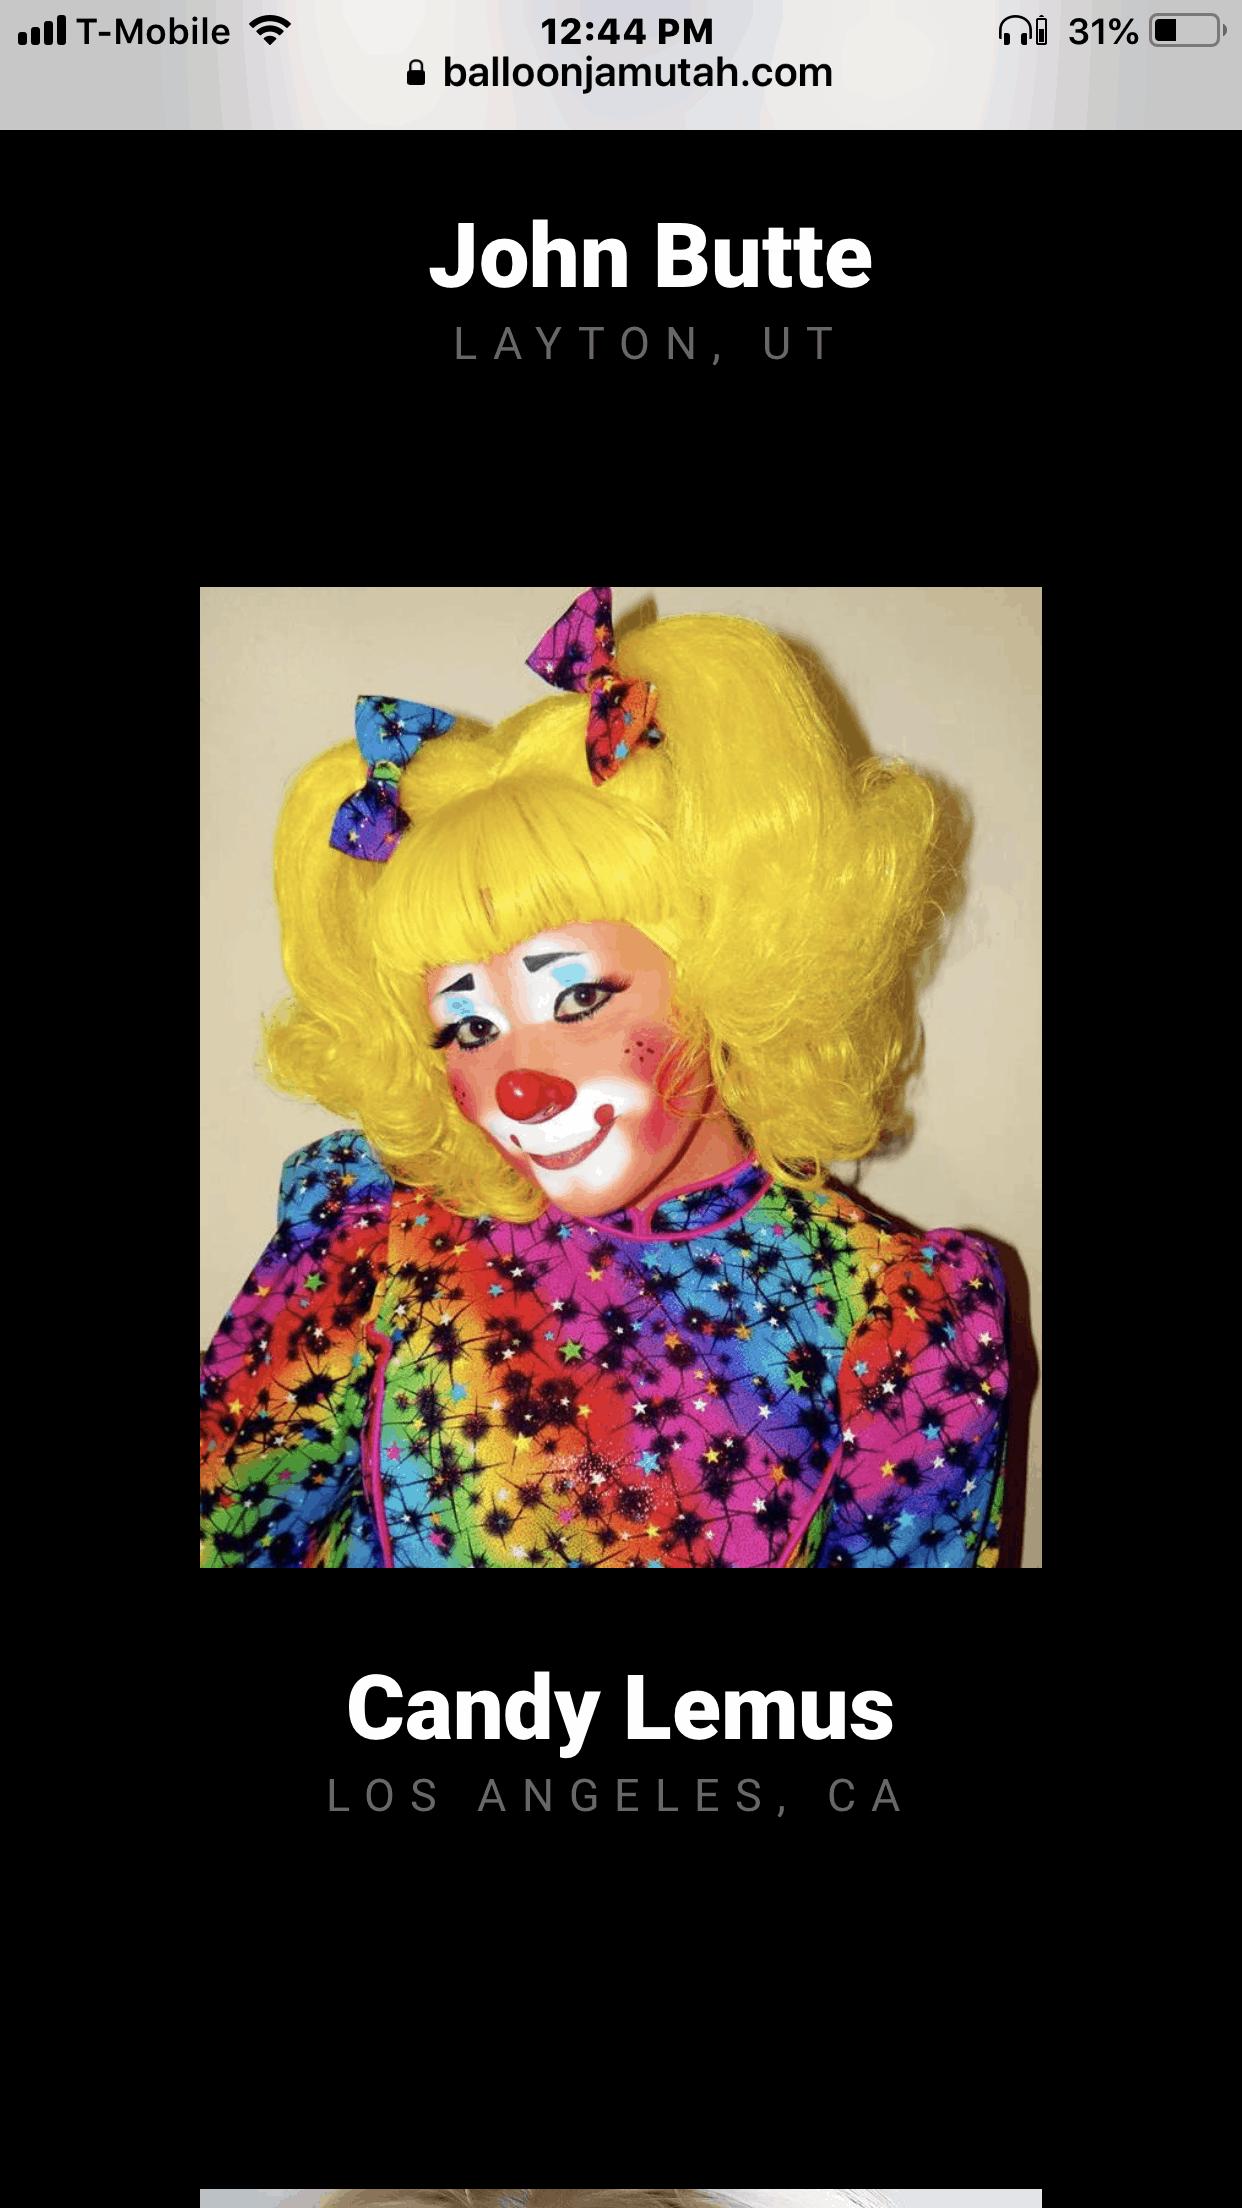 Sponsor: Candy Lemus